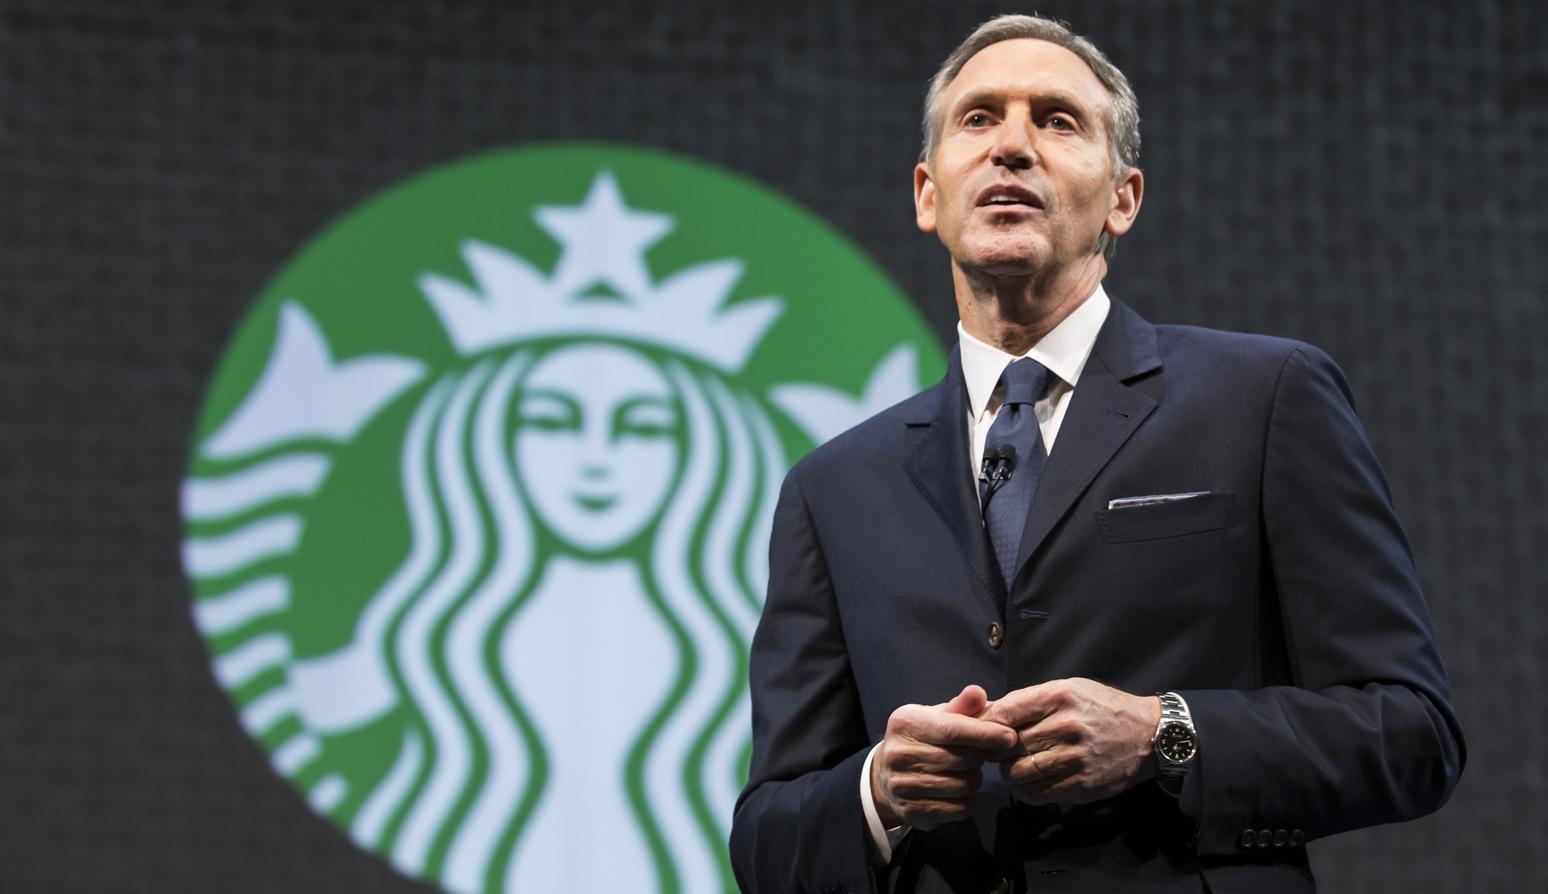 Howard Schultz (Starbucks): Inspiring Success Story